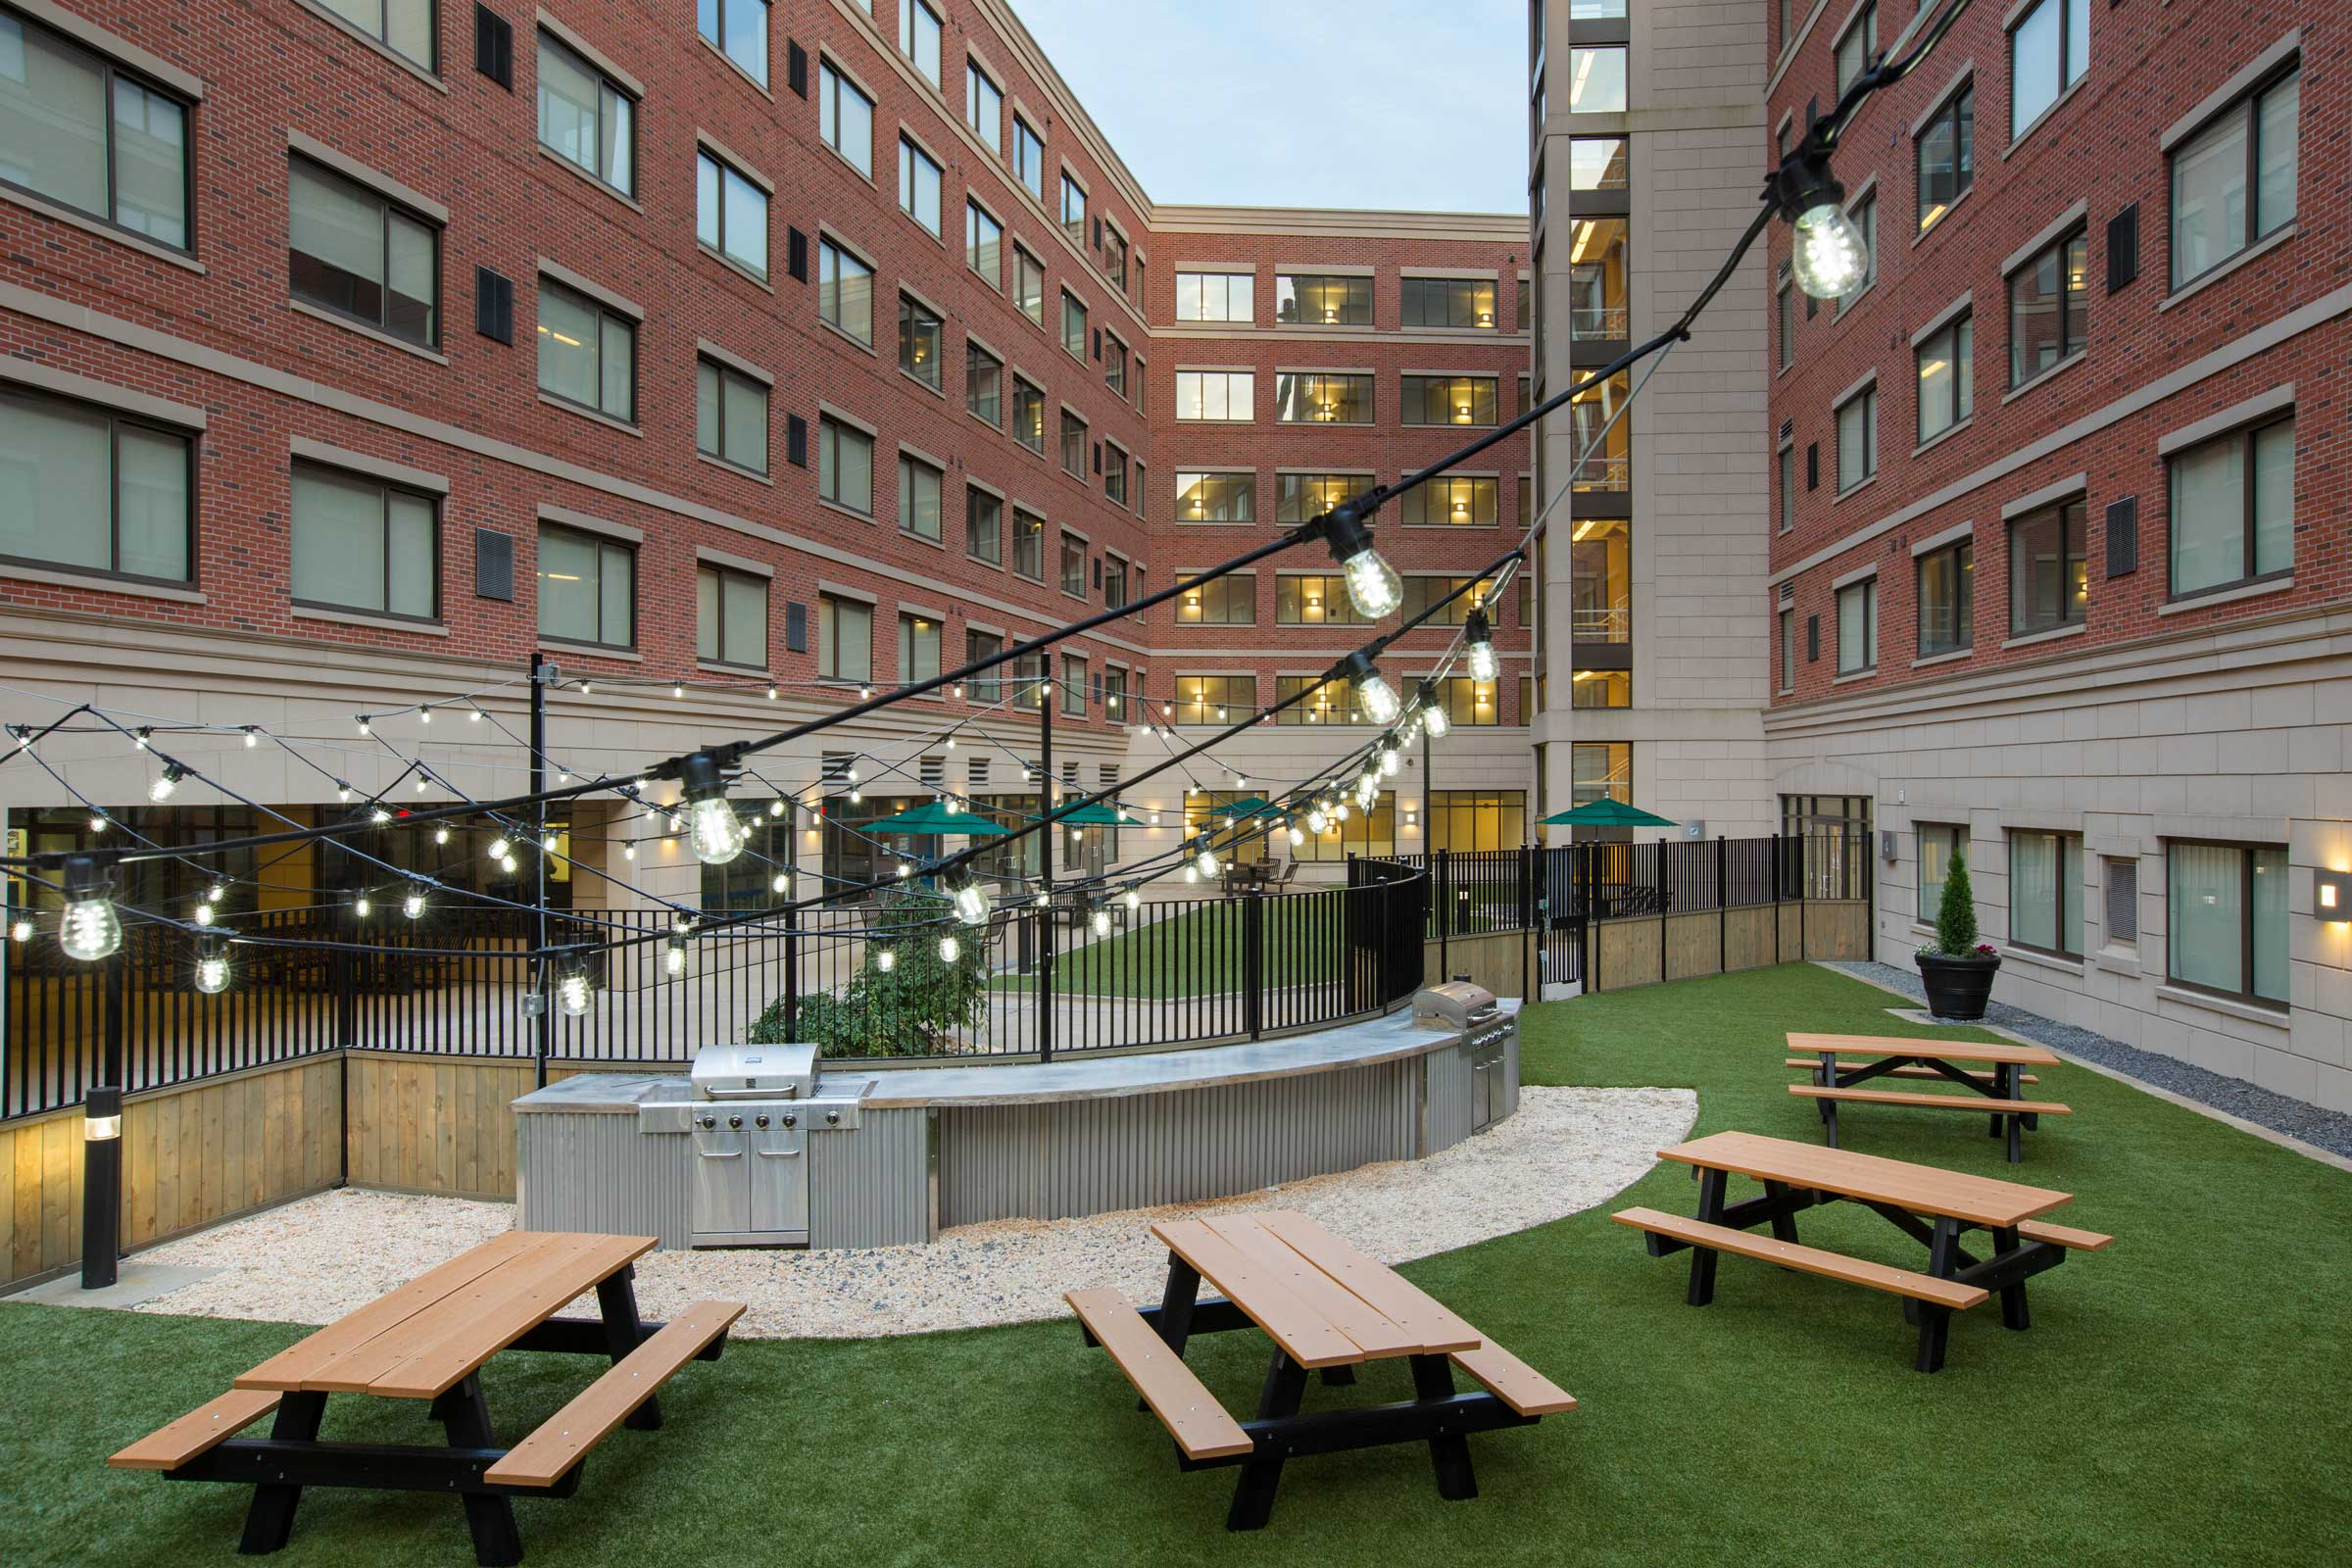 9345-Courtyard-2-WEB